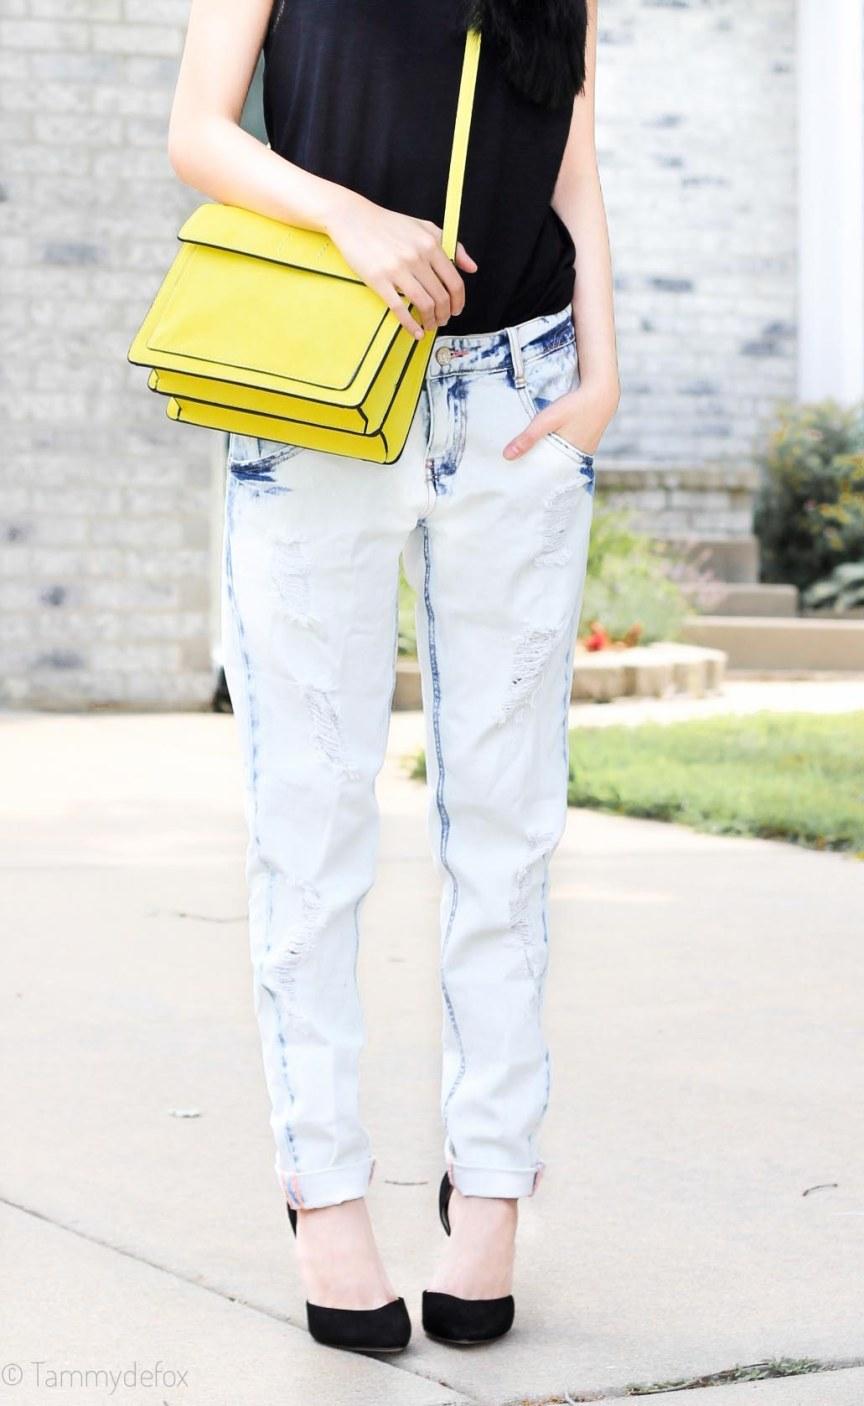 tammy_de_fox_boyfriend_jeans-7